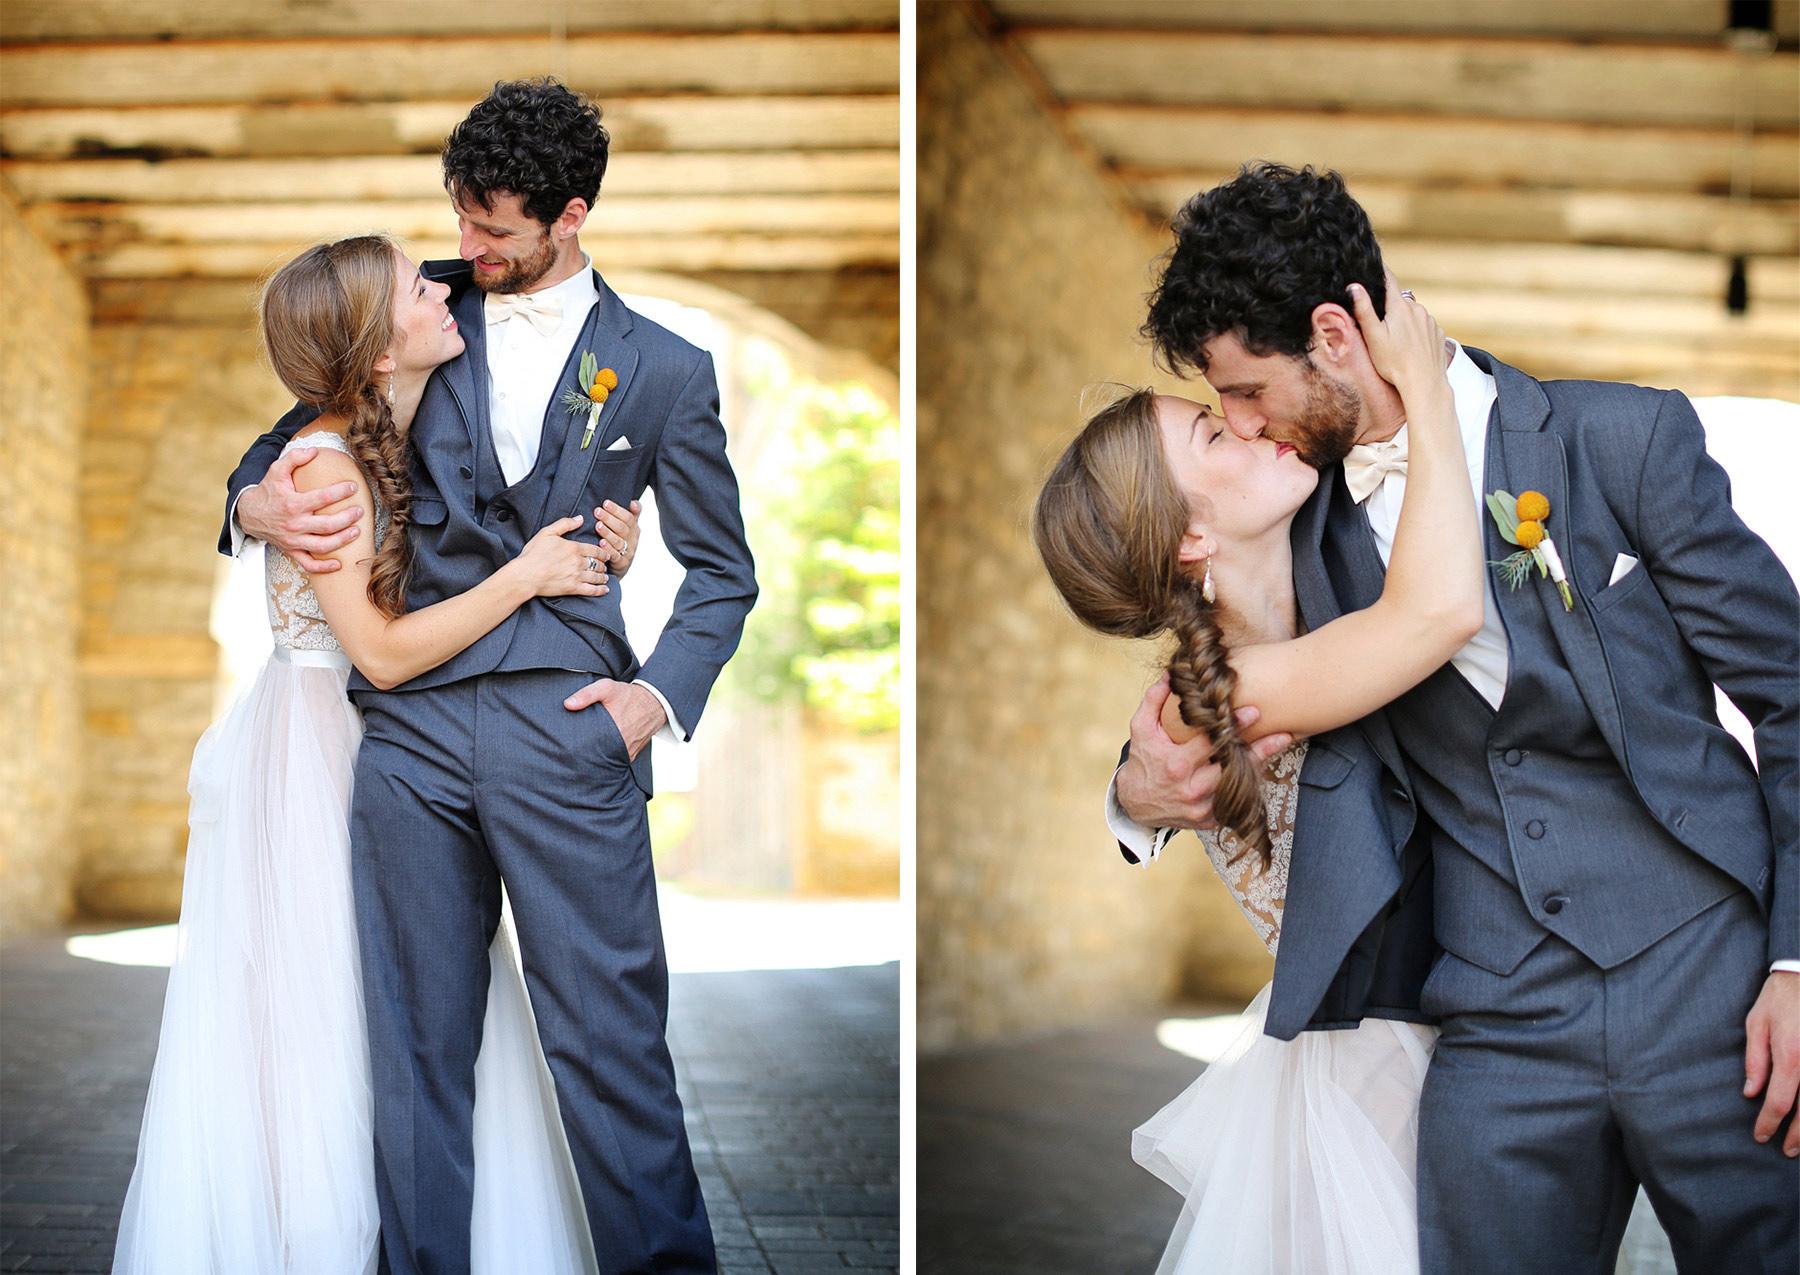 15-Minneapolis-Minnesota-Wedding-Photography-by-Vick-Photography-Downtown-Sarah-&-Tom.jpg